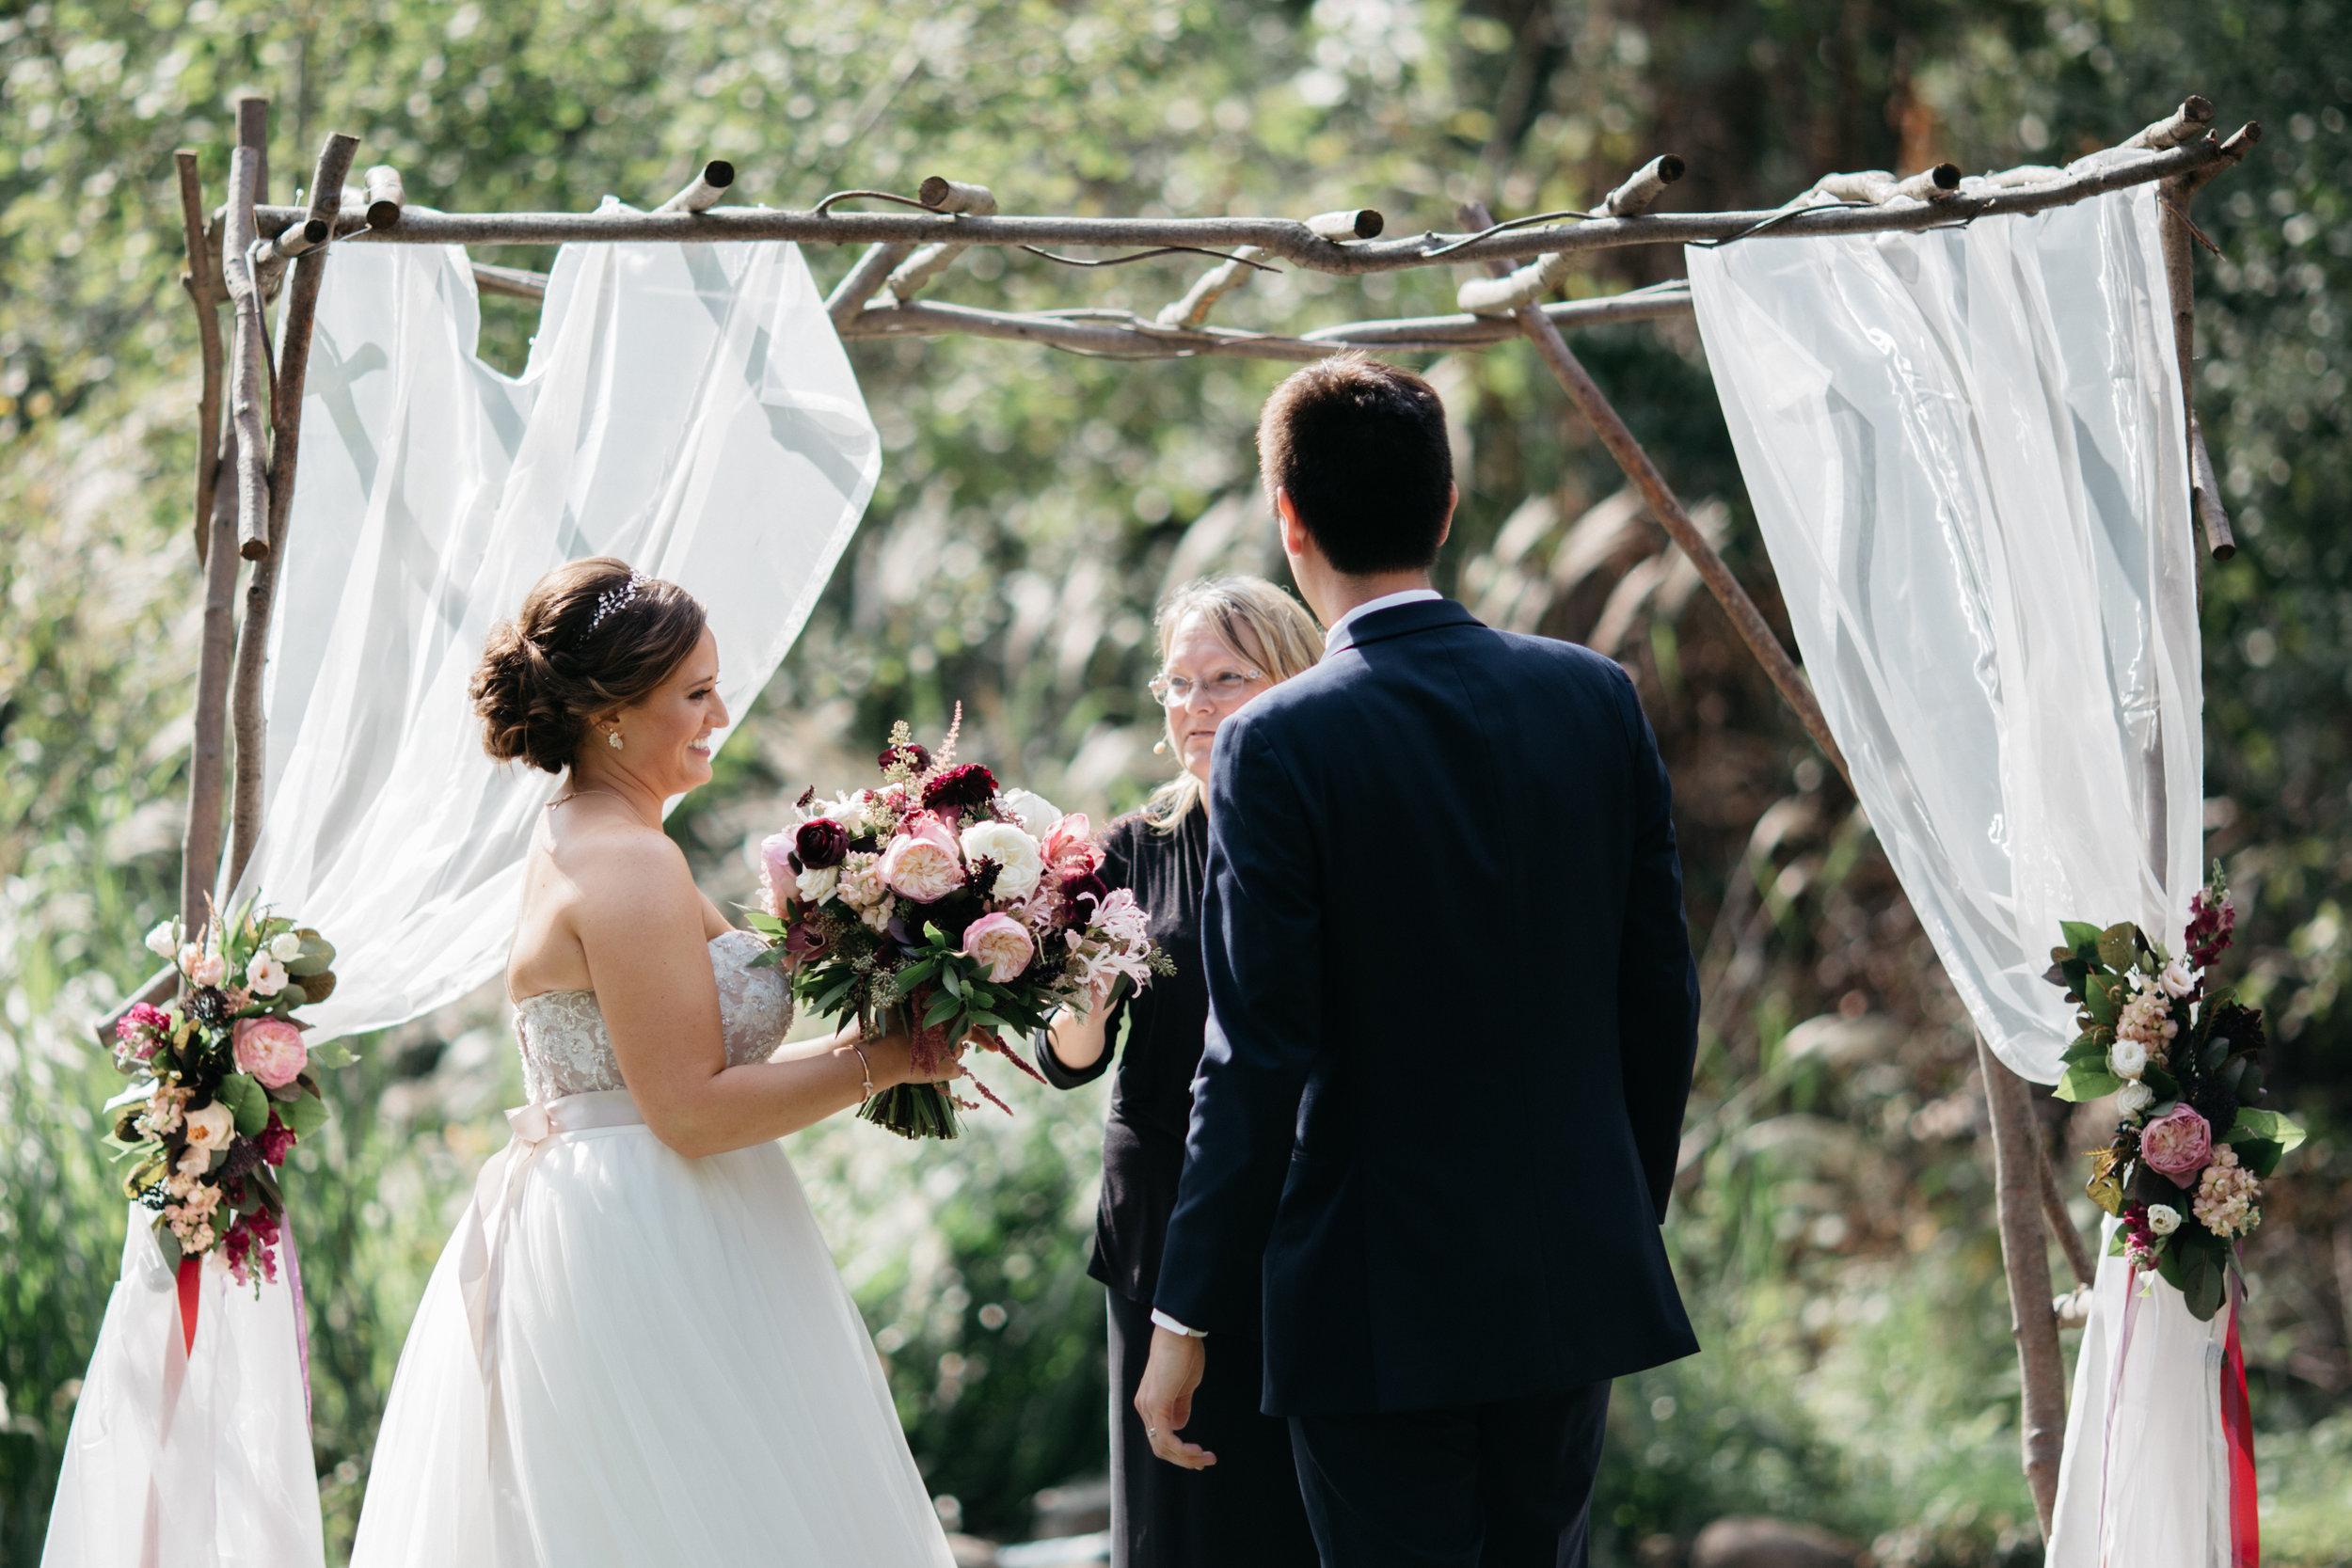 Vineyard wedding ceremony at Grand View Lodge. Photography by Britt DeZeeuw.